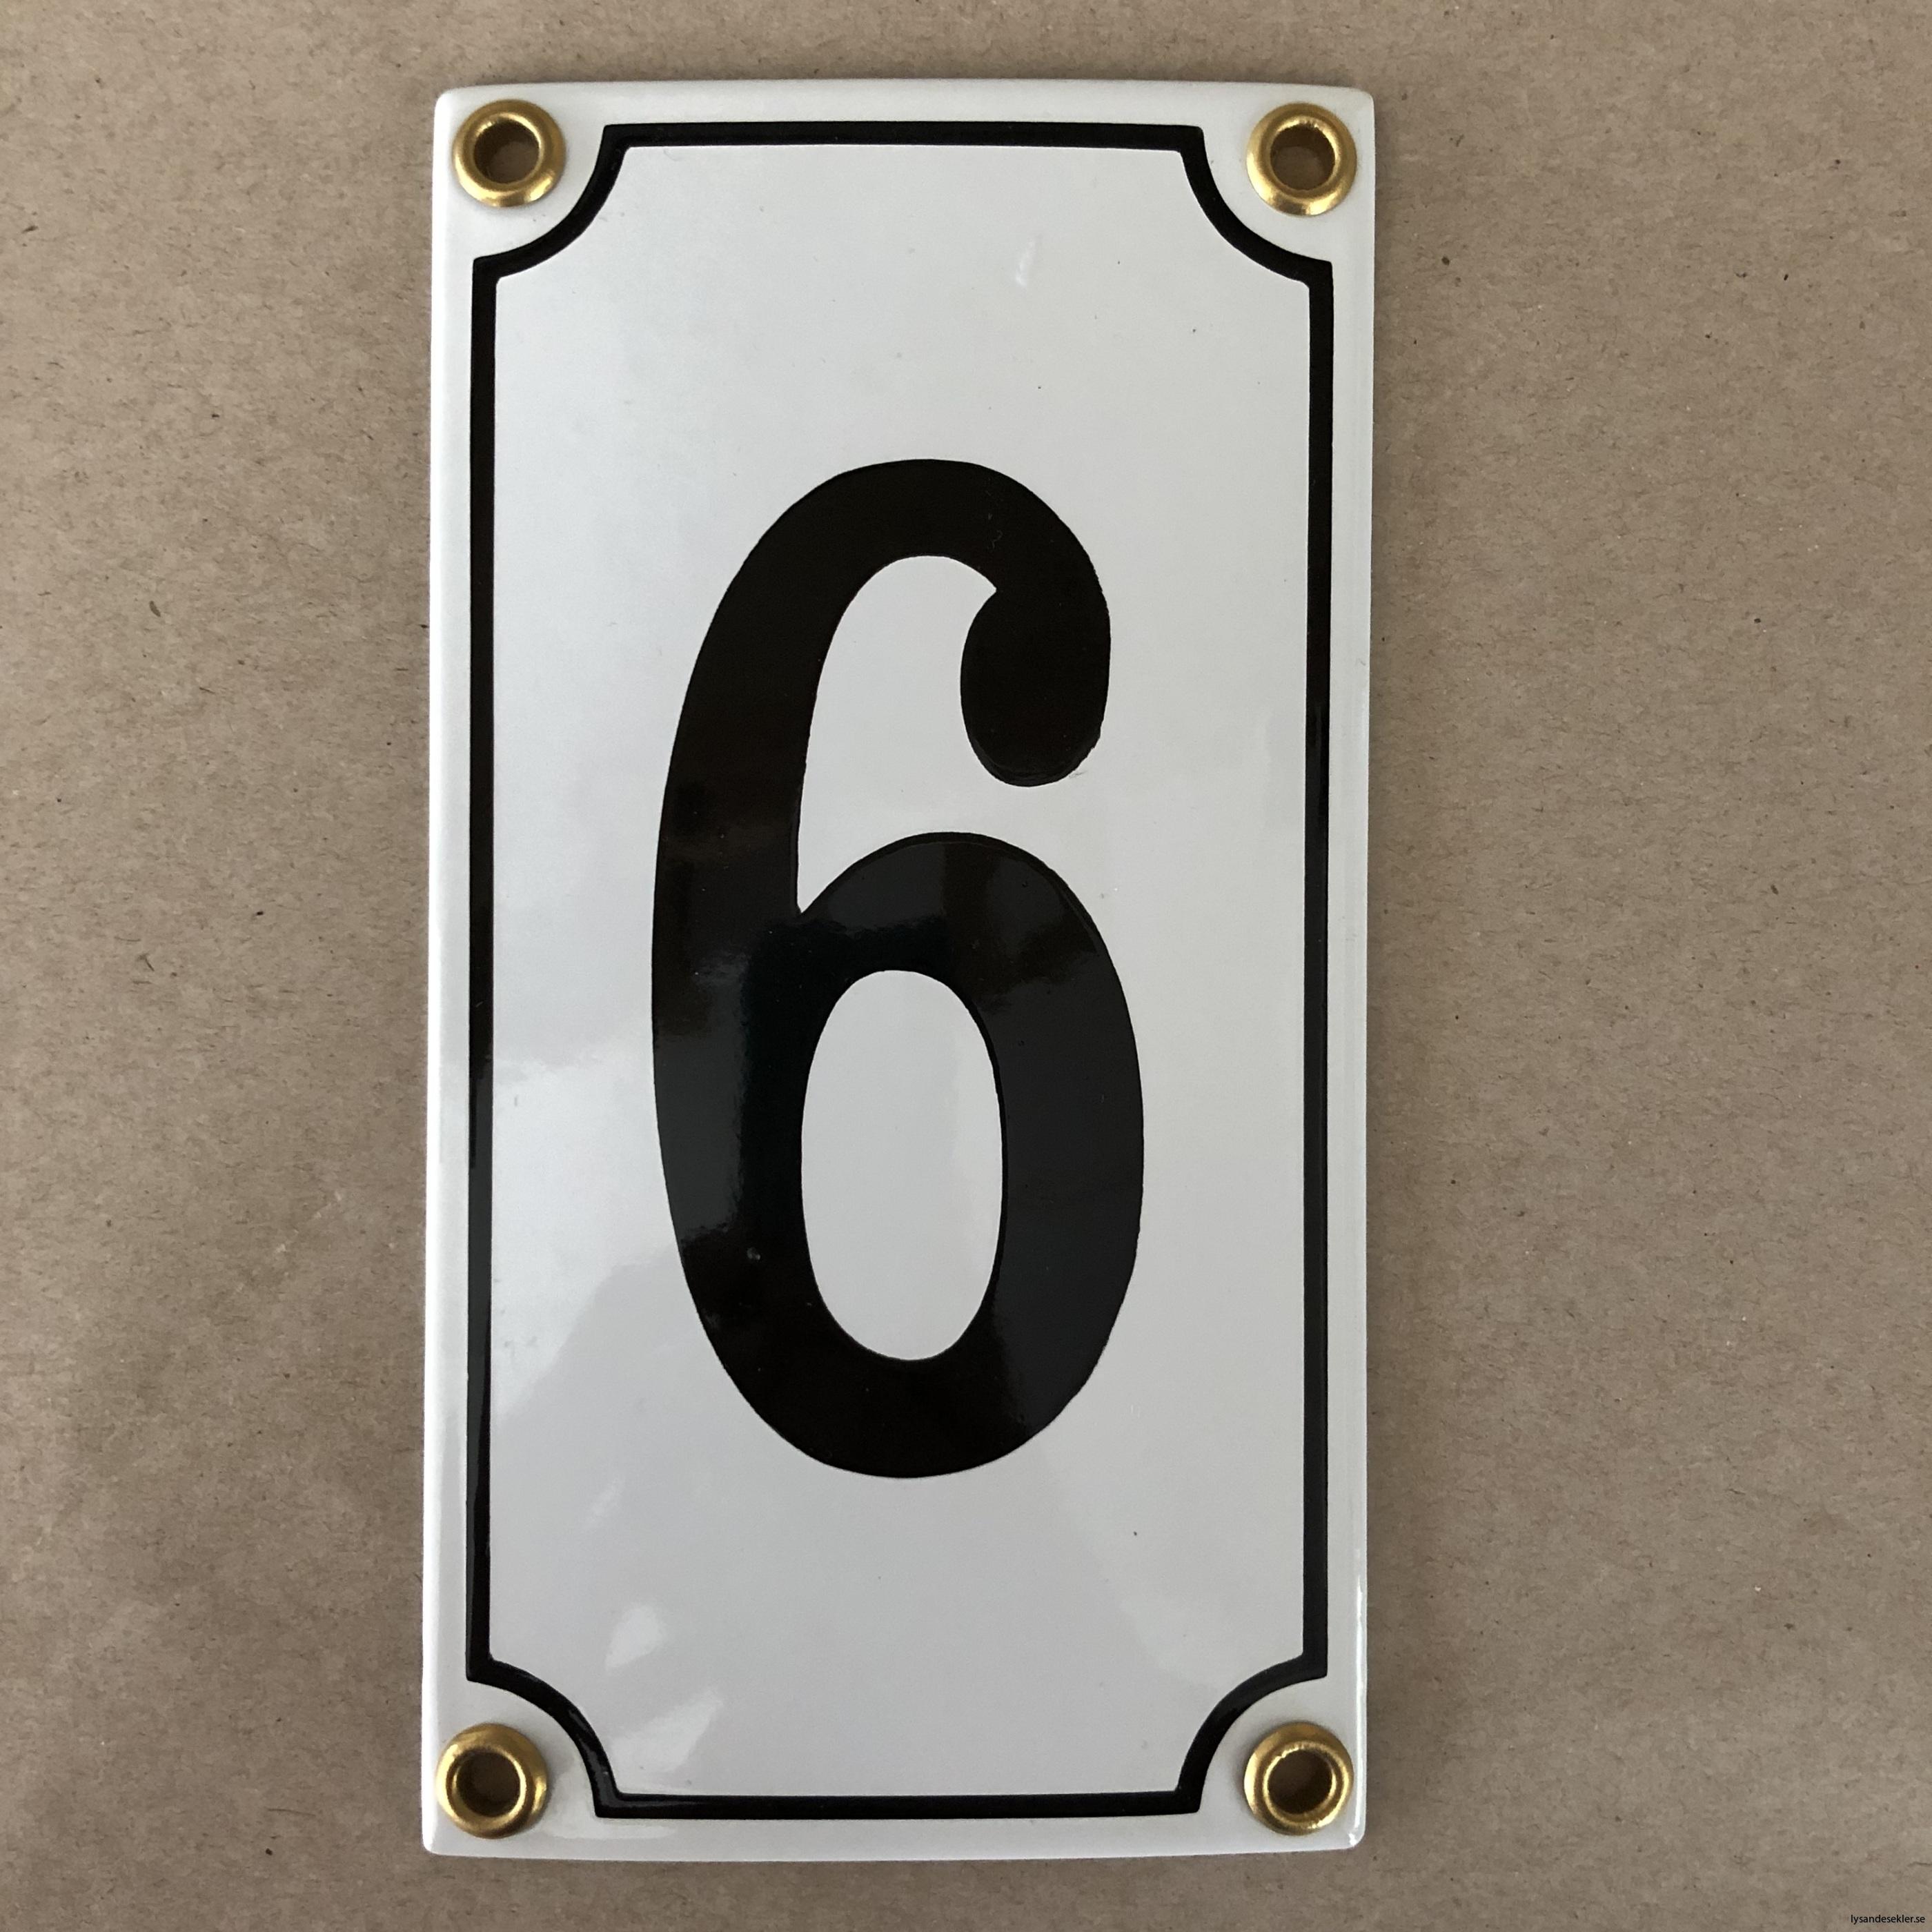 emaljsiffra siffra i emalj fasadsiffra nummer18